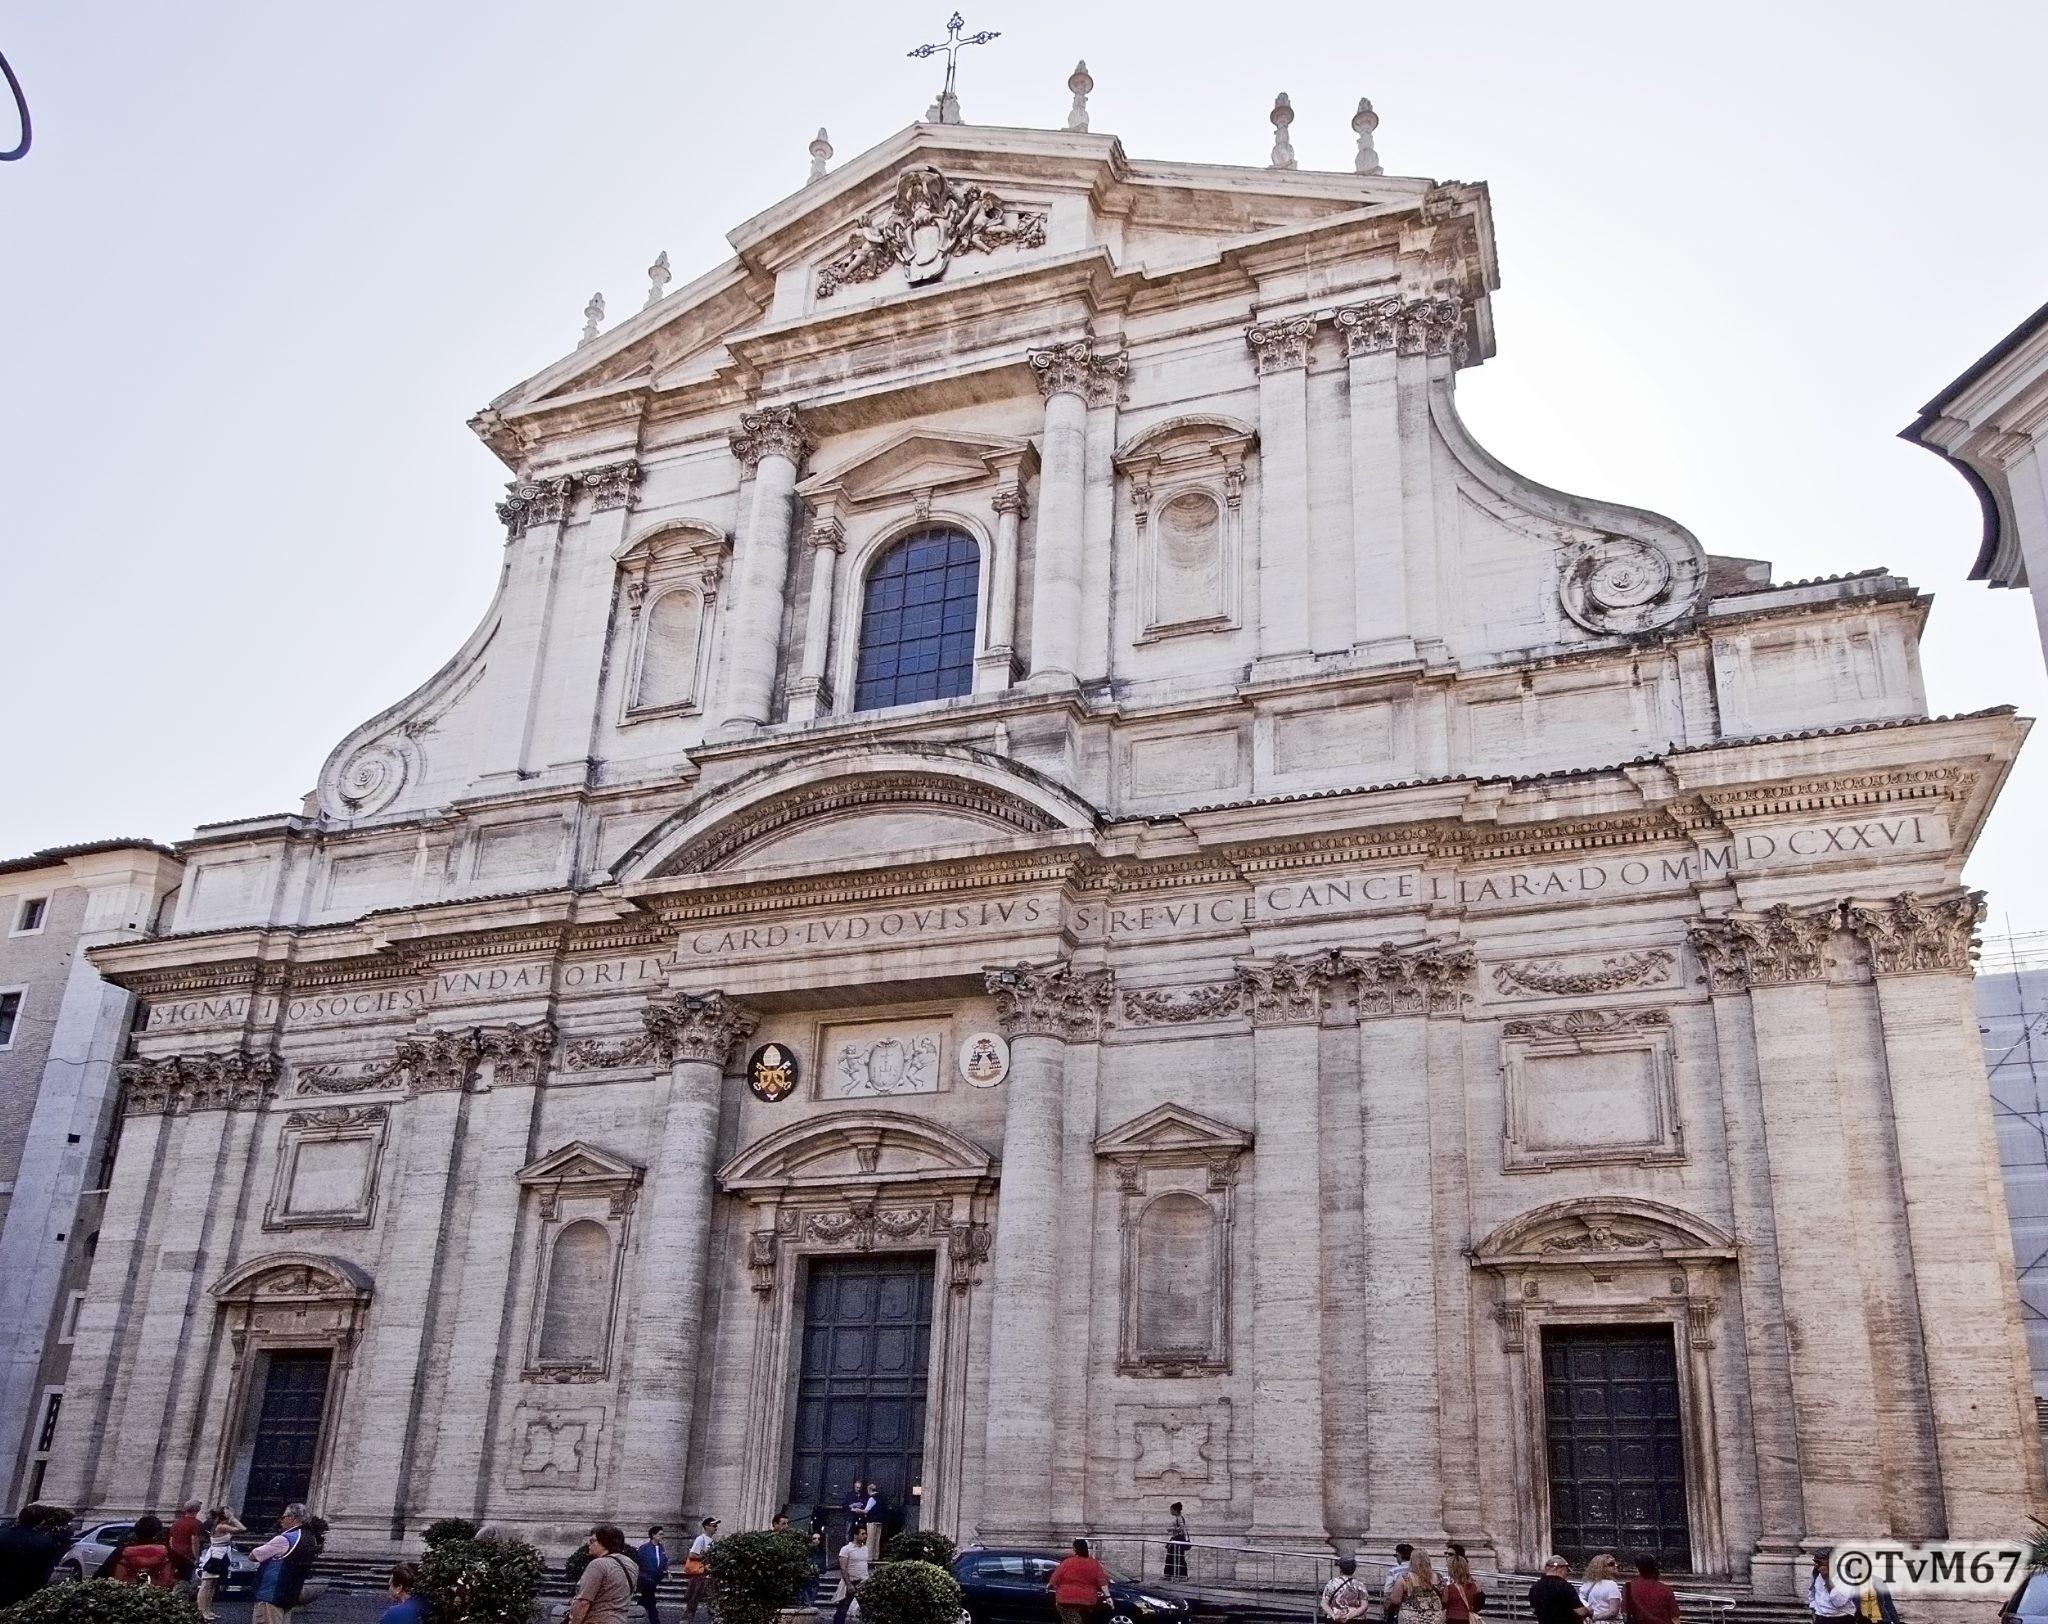 Roma, Chiesa di Sant'Ignazio, Gevel